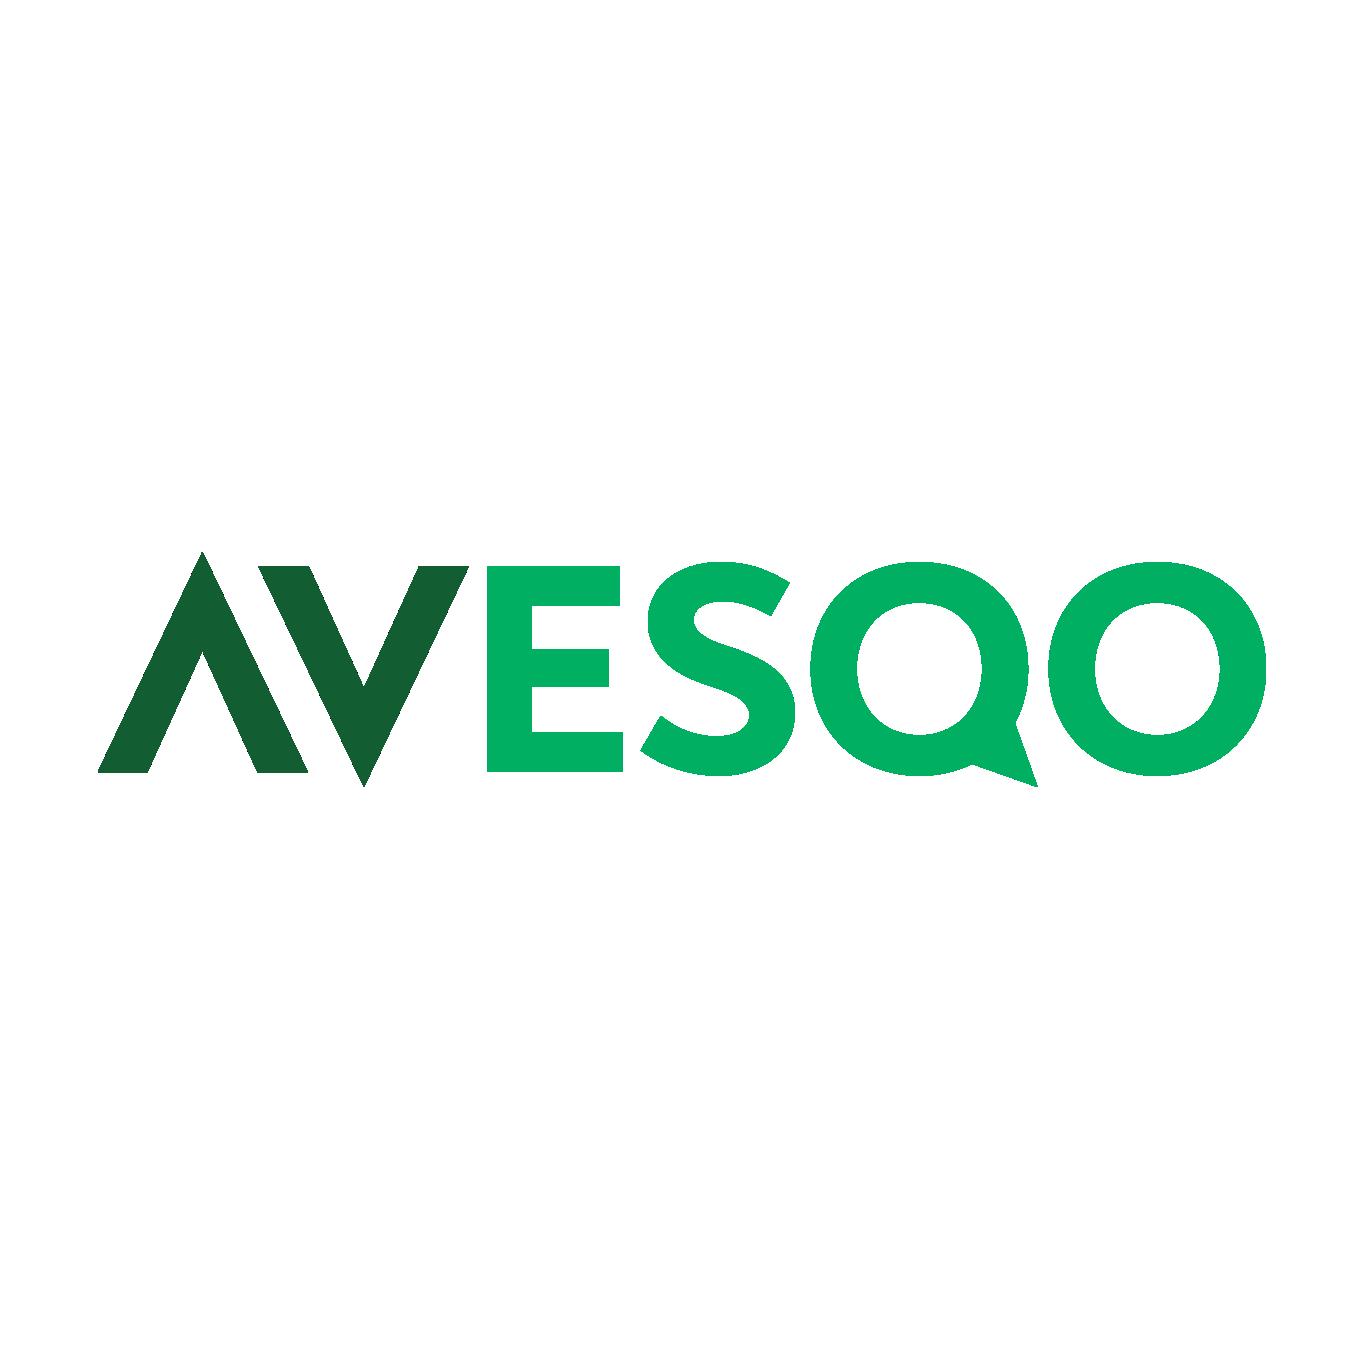 Avesqo-01